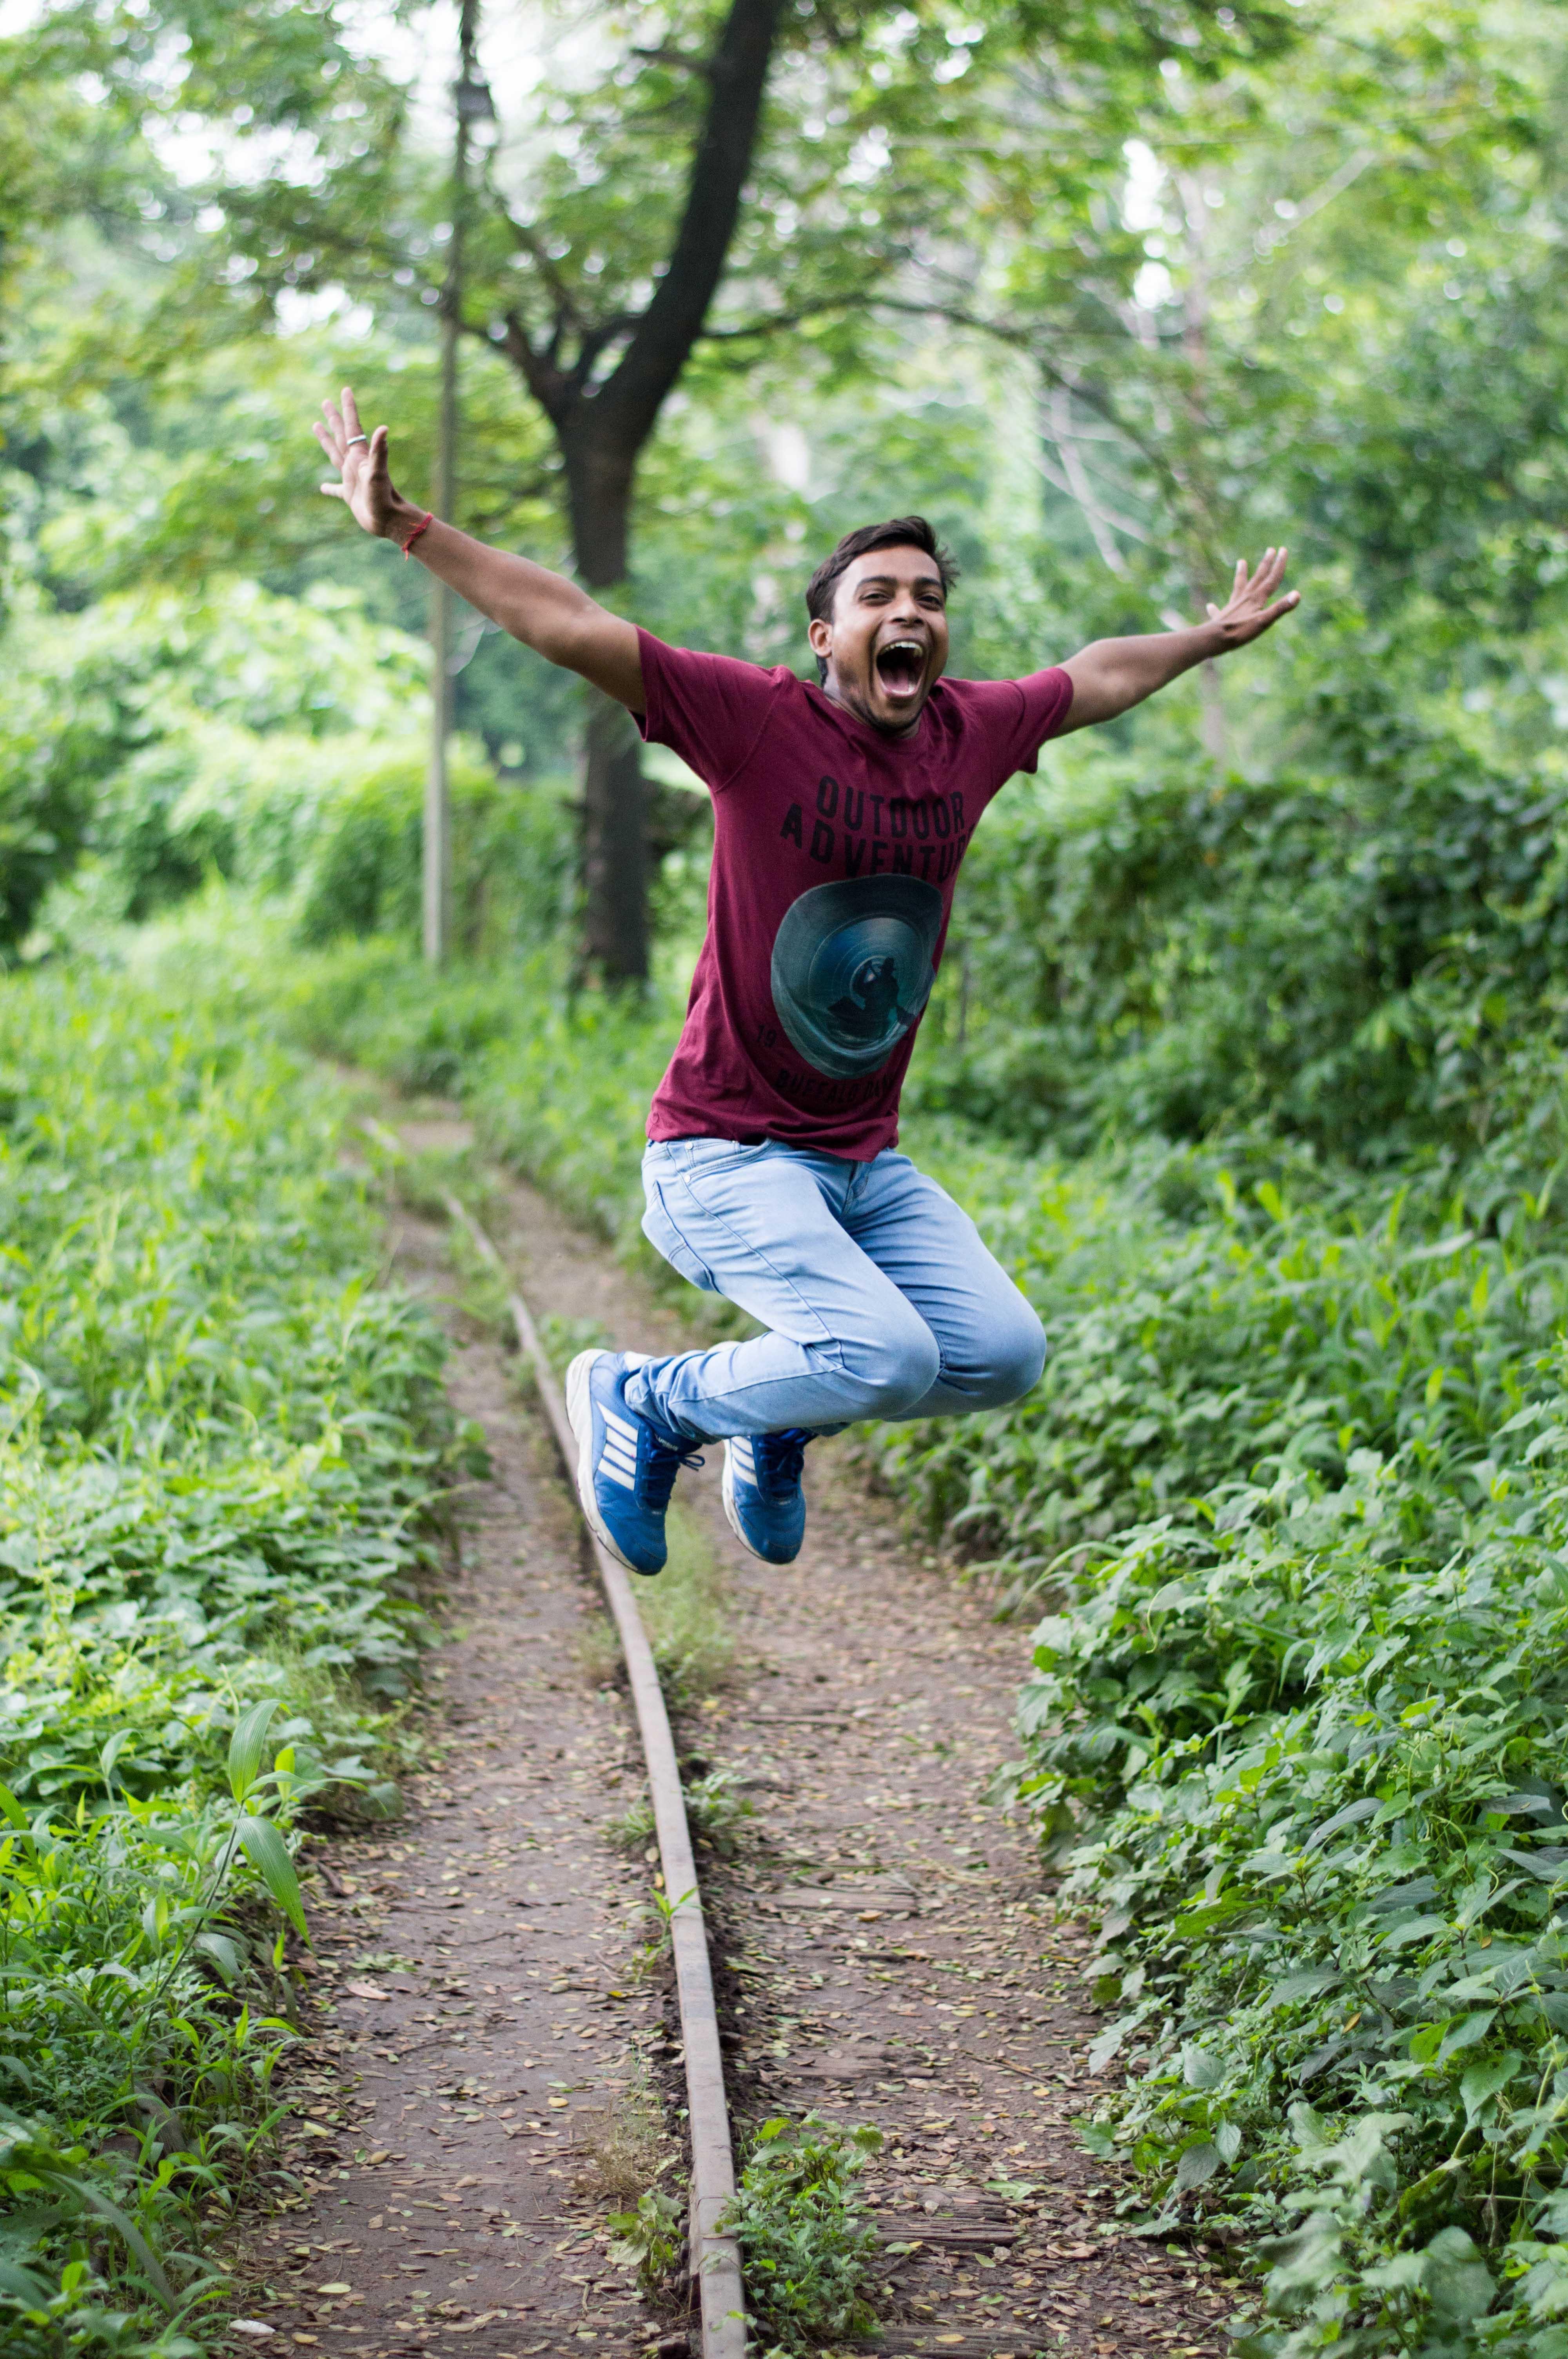 Jump Shot Photo of Man Near Tree